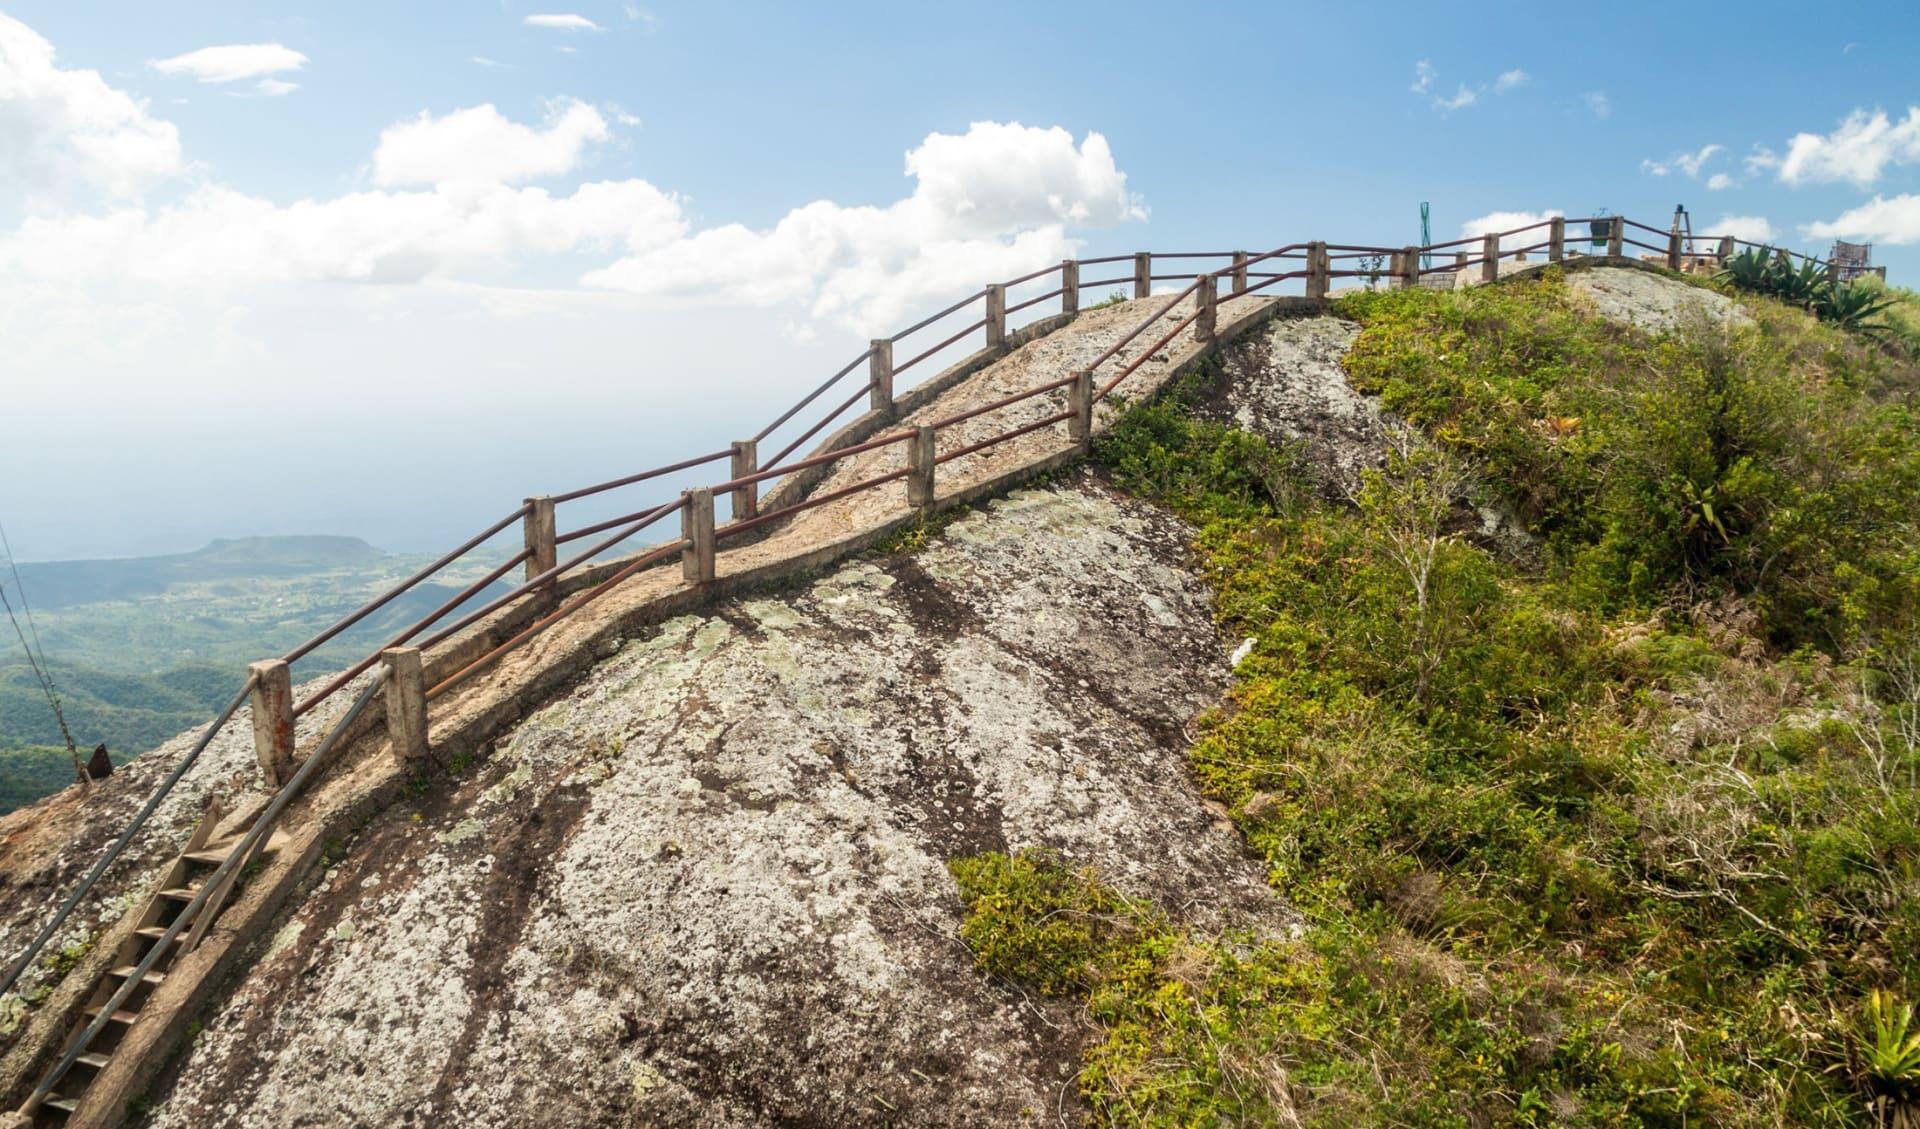 La Gran Piedra (Big Rock) in der Sierra Maestra Gebirgskette bei Santiago de Cuba, Kuba